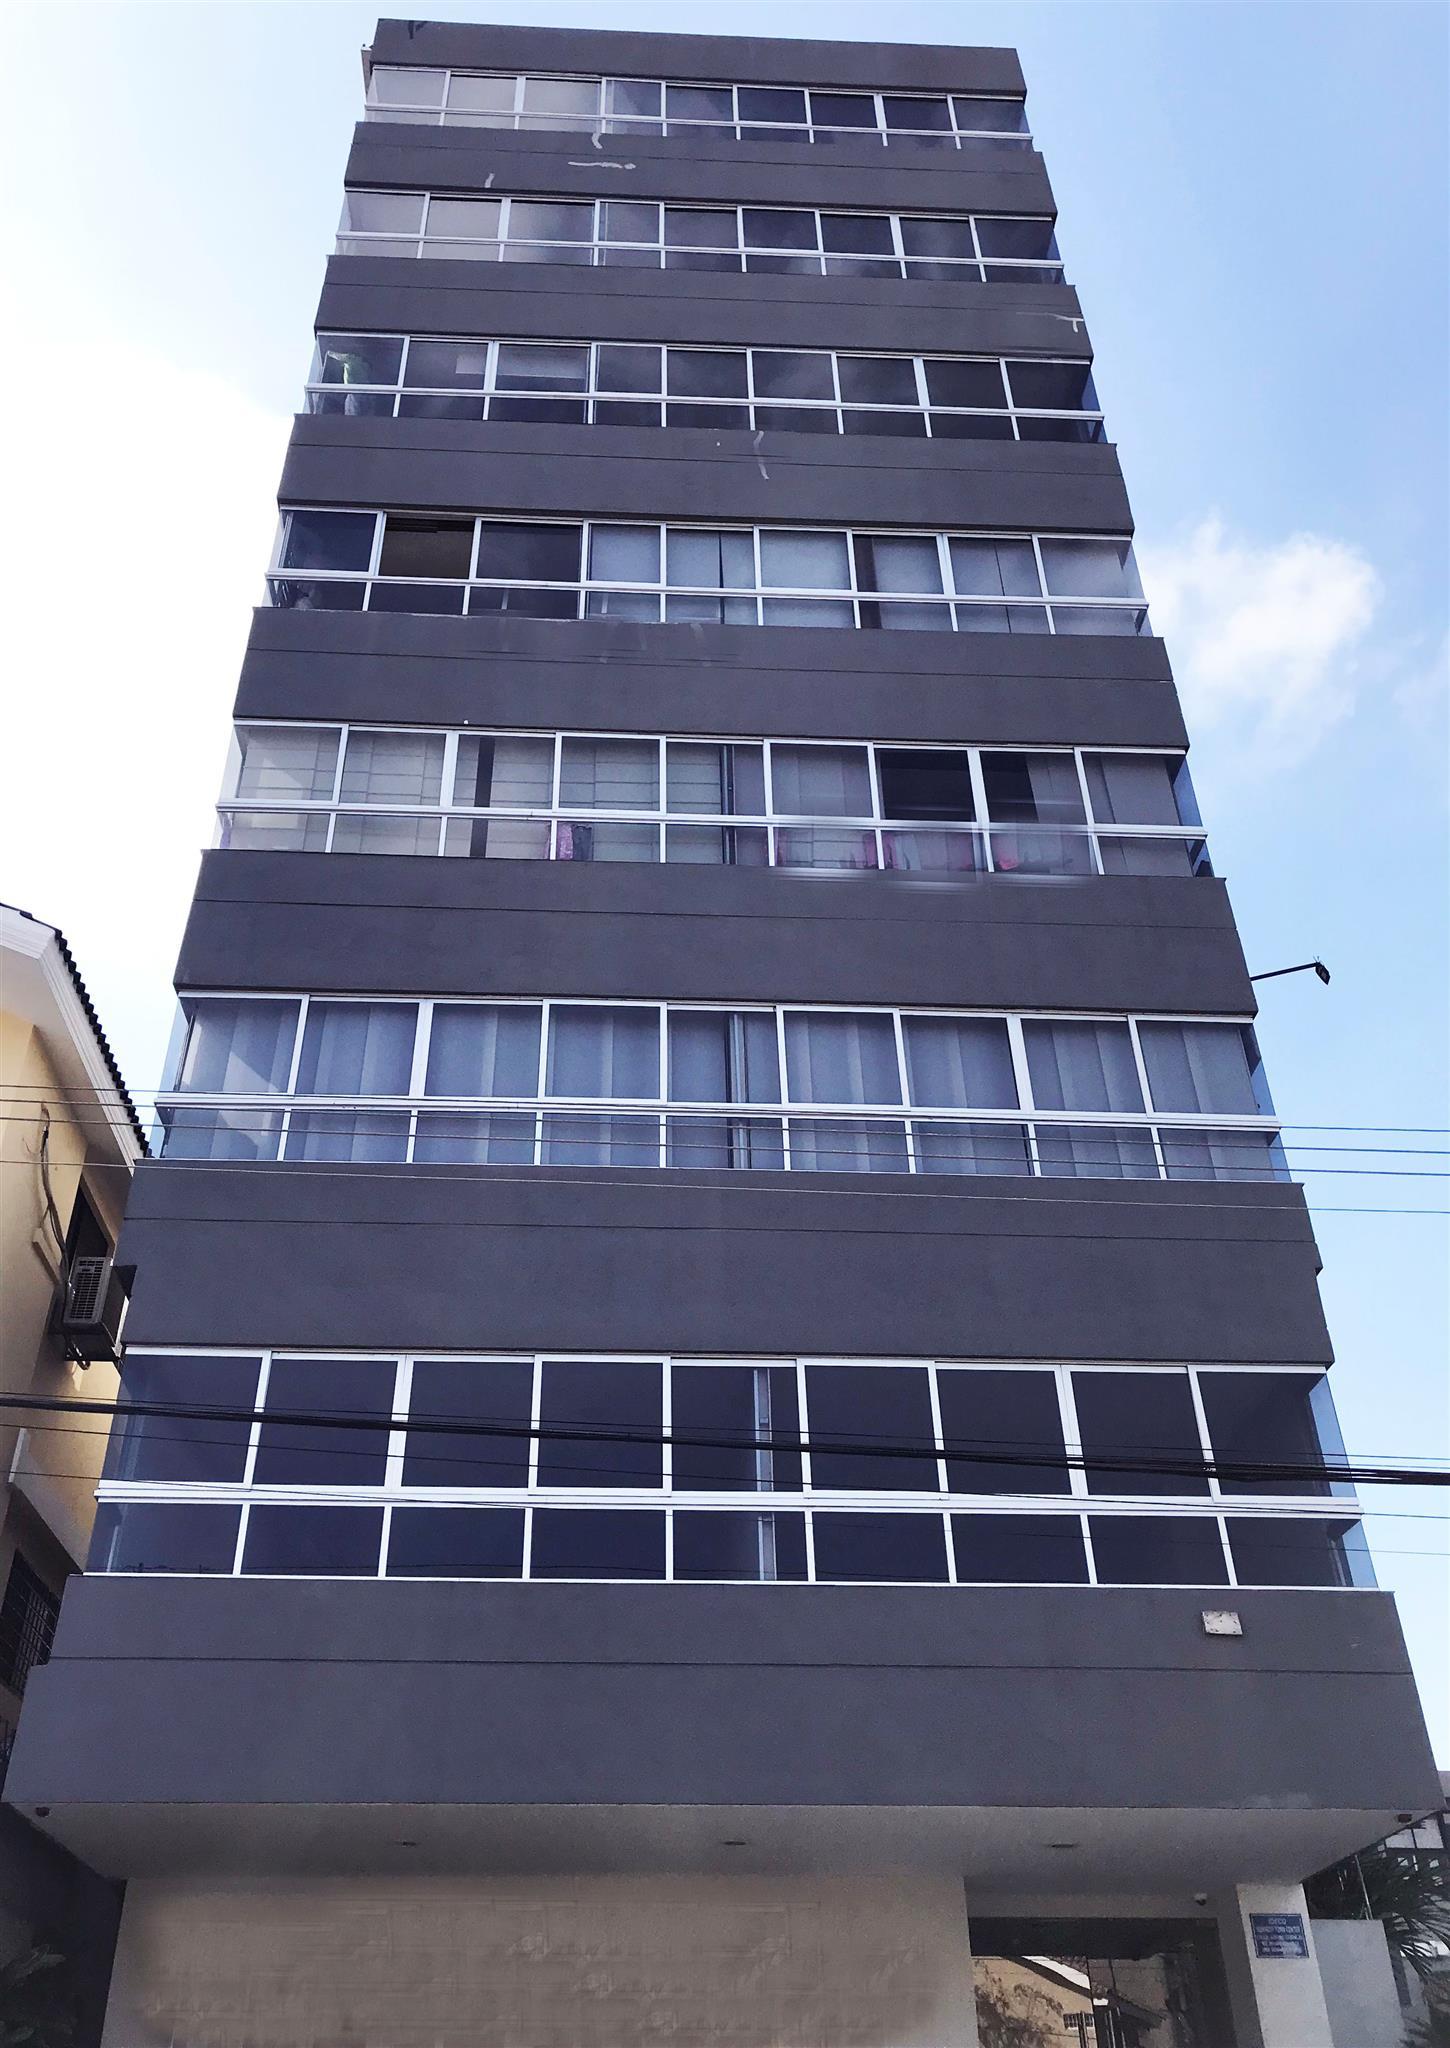 Alquiler Departamento KENNEDY NORTE, Guayaquil: Estrénelo!!